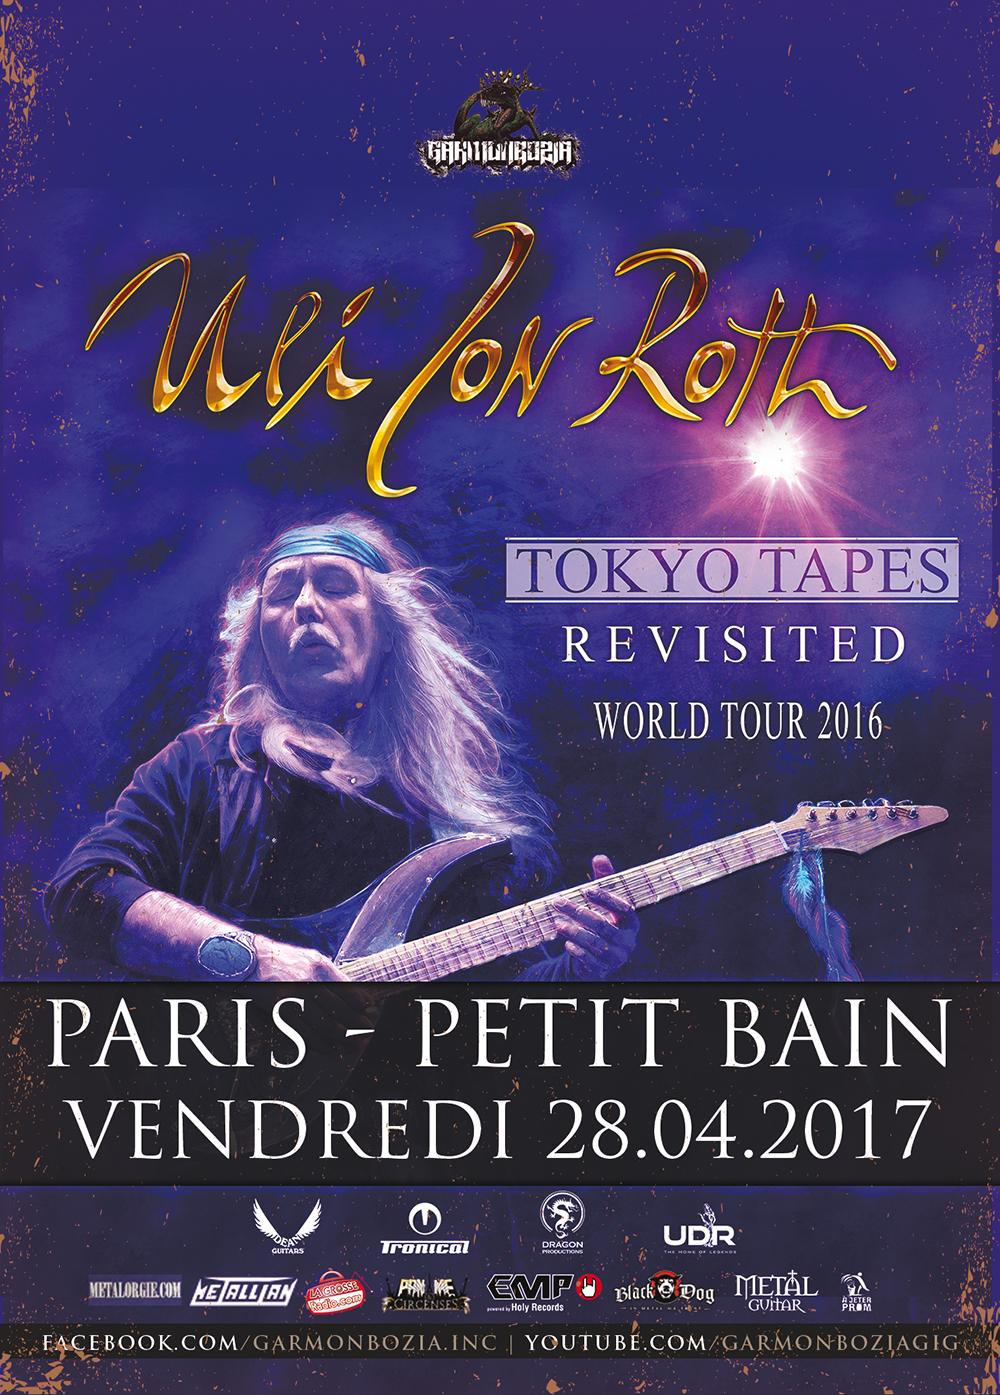 Uli Jon Roth à Paris